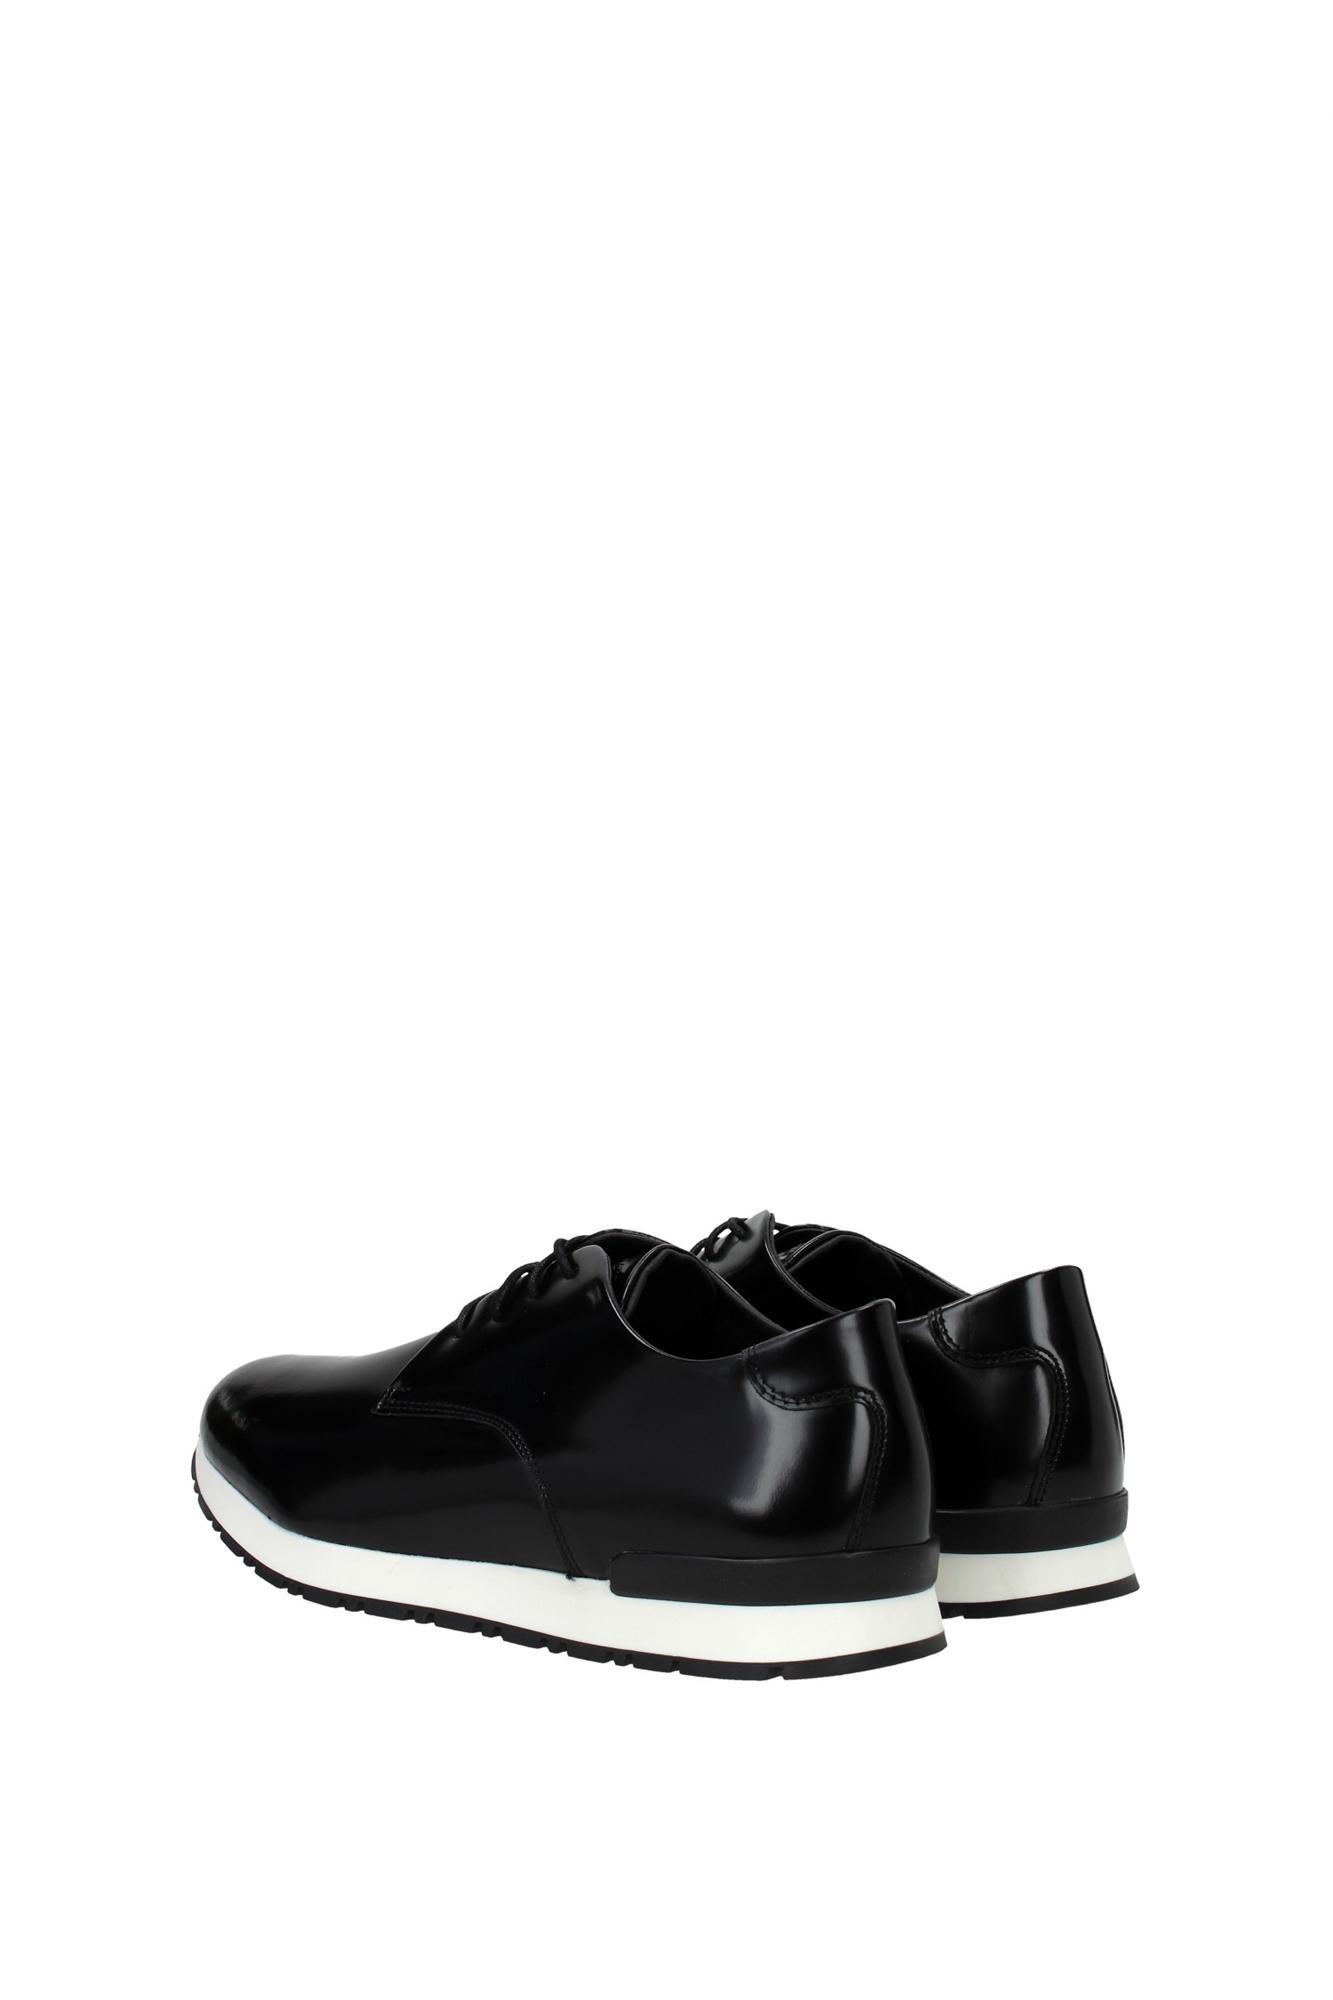 lace up shoes armani collezioni leather black bi5241612